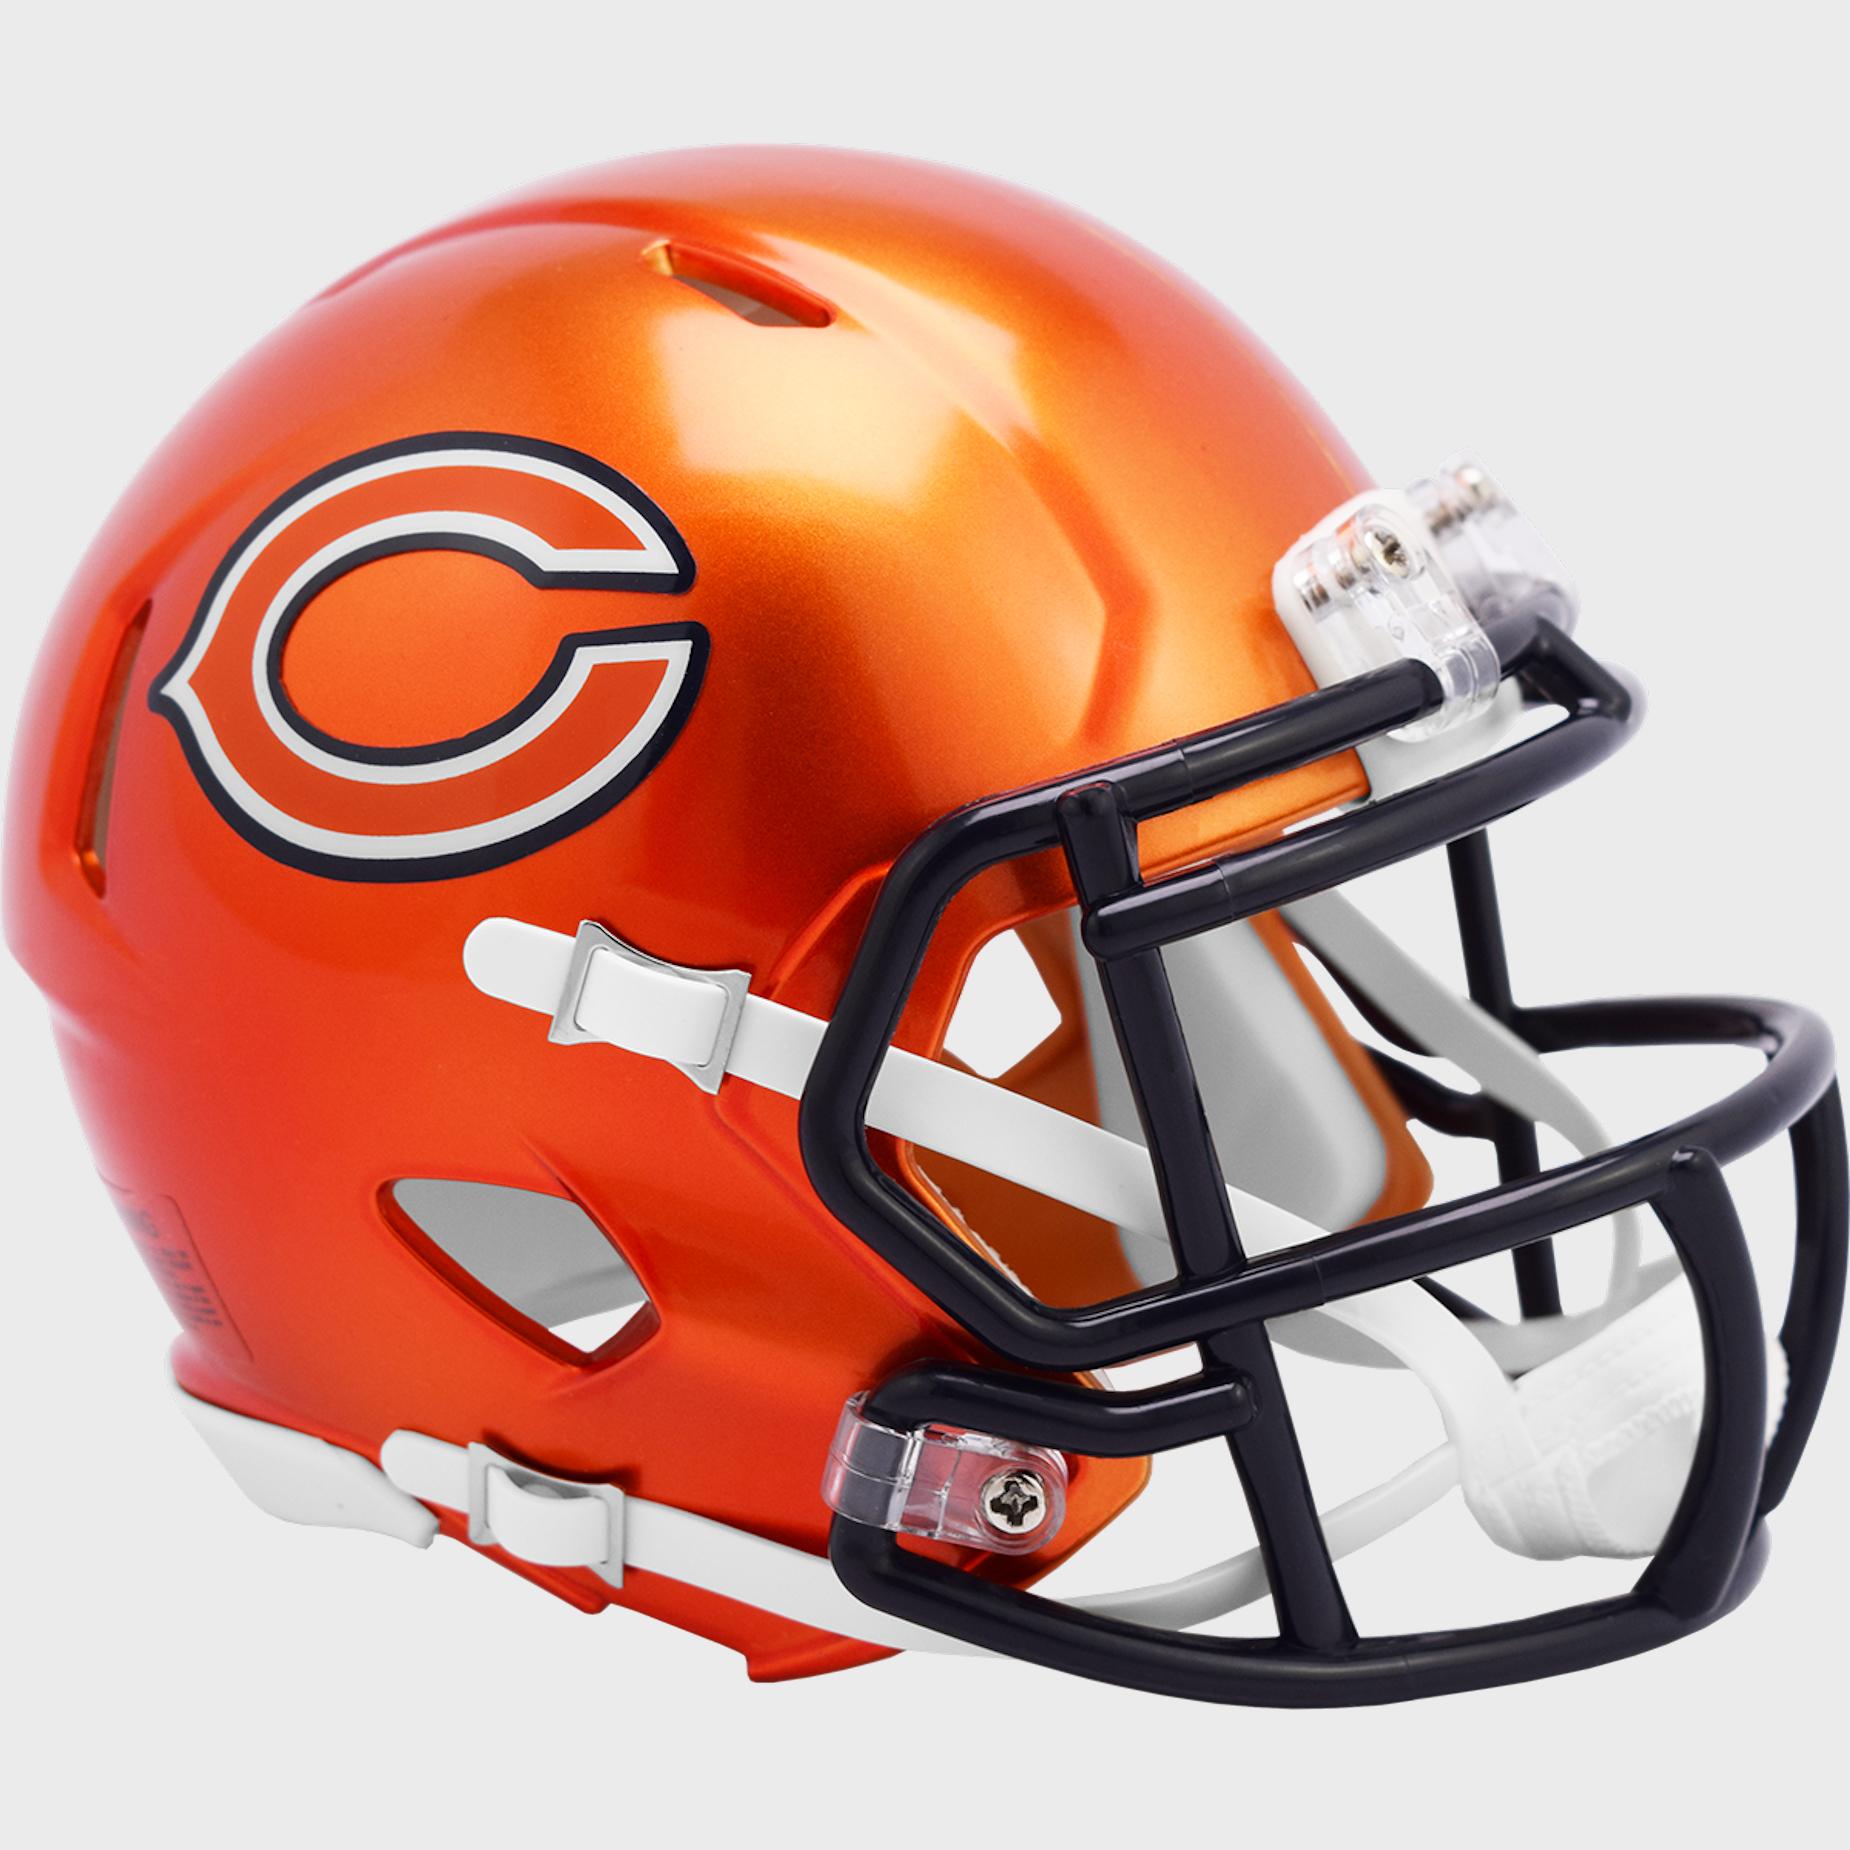 Chicago Bears Speed Mini Football Helmet <B>FLASH ESD 8/21/21</B>